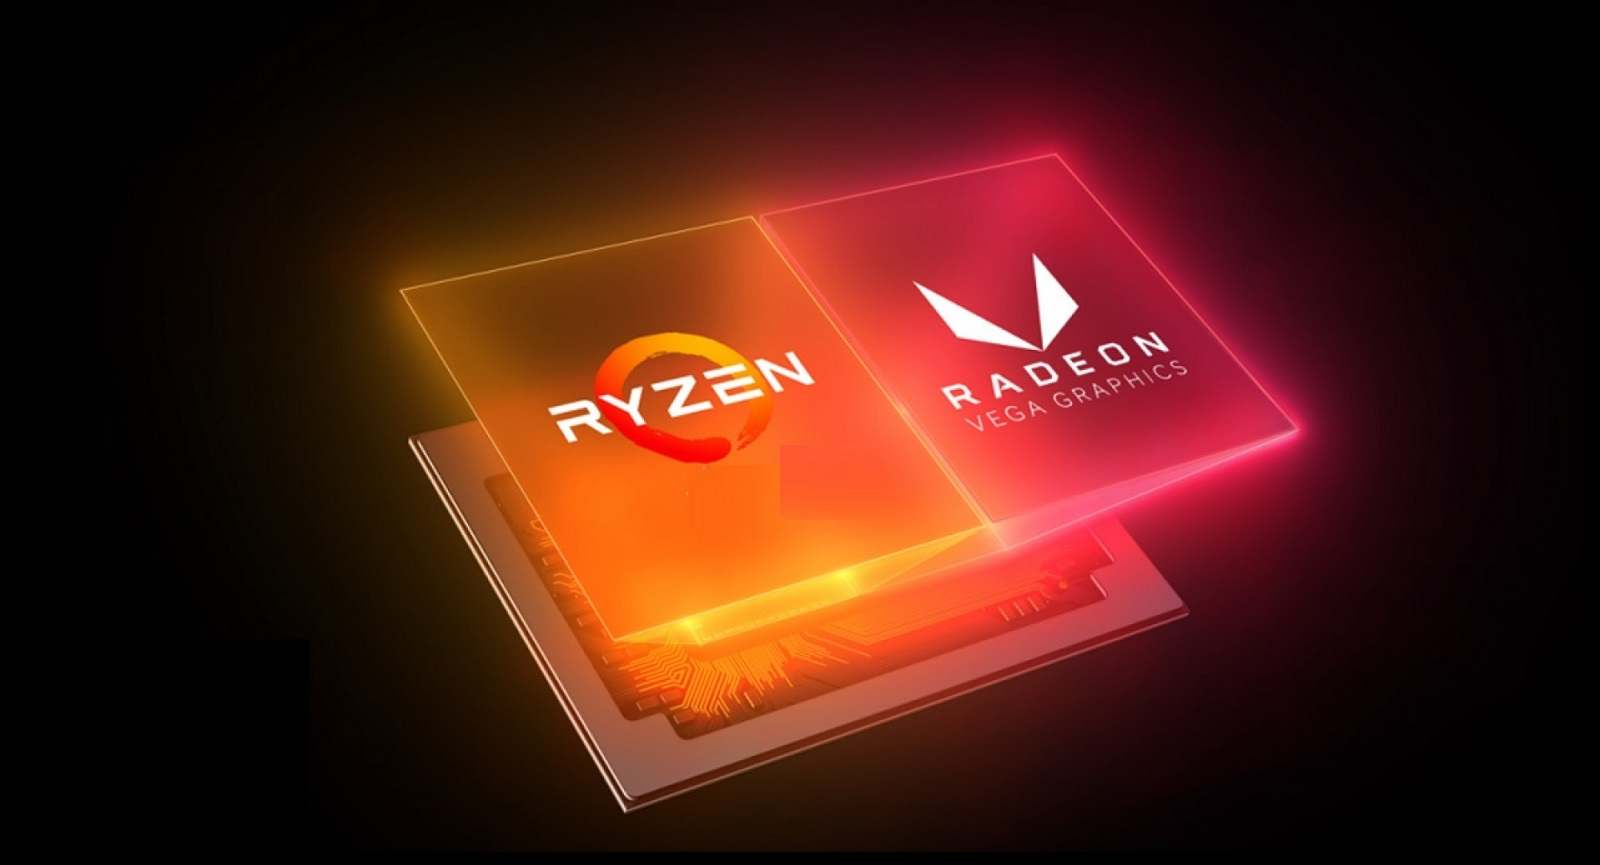 Ryzen 5 3400G و Ryzen 3 3200G بر پایه معماری Picasso هستند